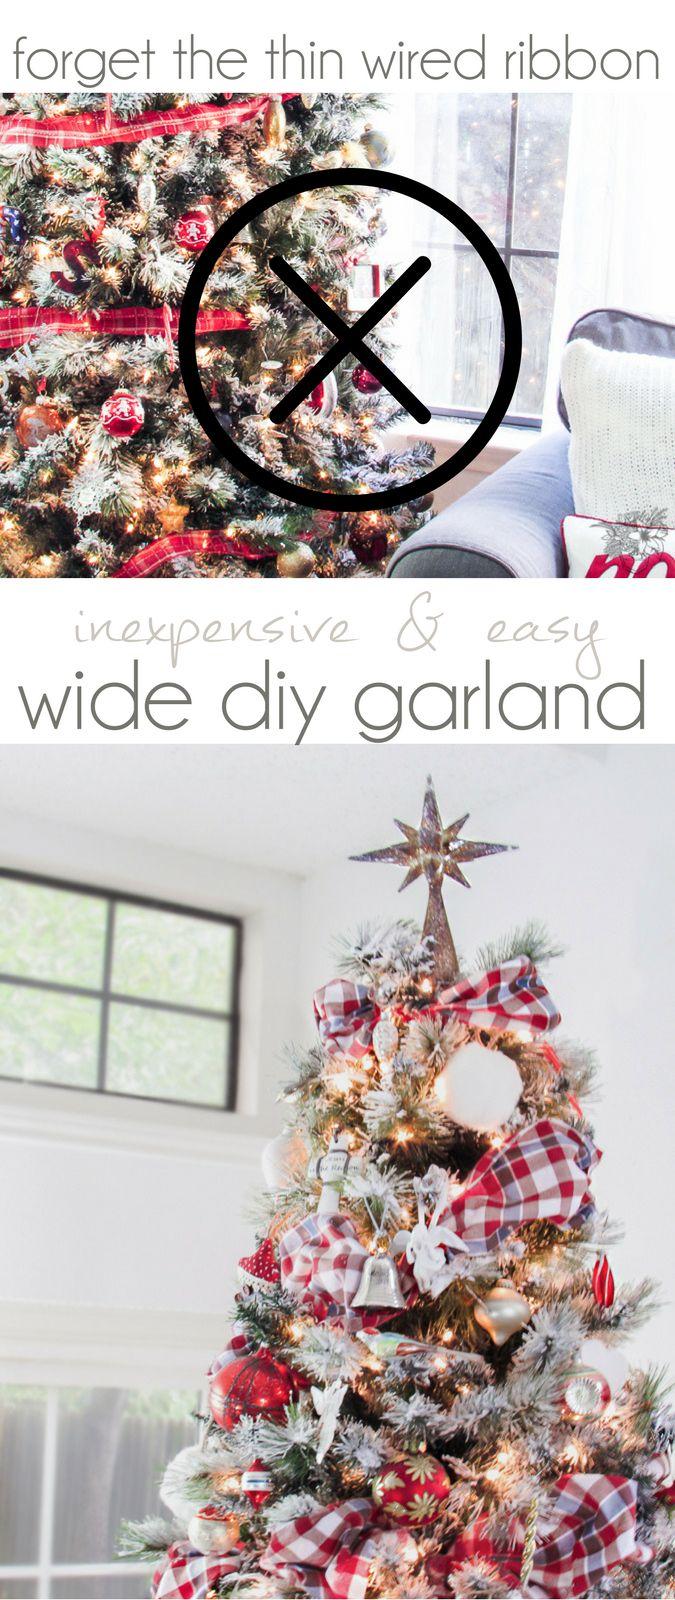 Christmas Tree Garlad, DIY Christmas Garland, Fast, Inexpensive and Easy DIY Fabric Garland